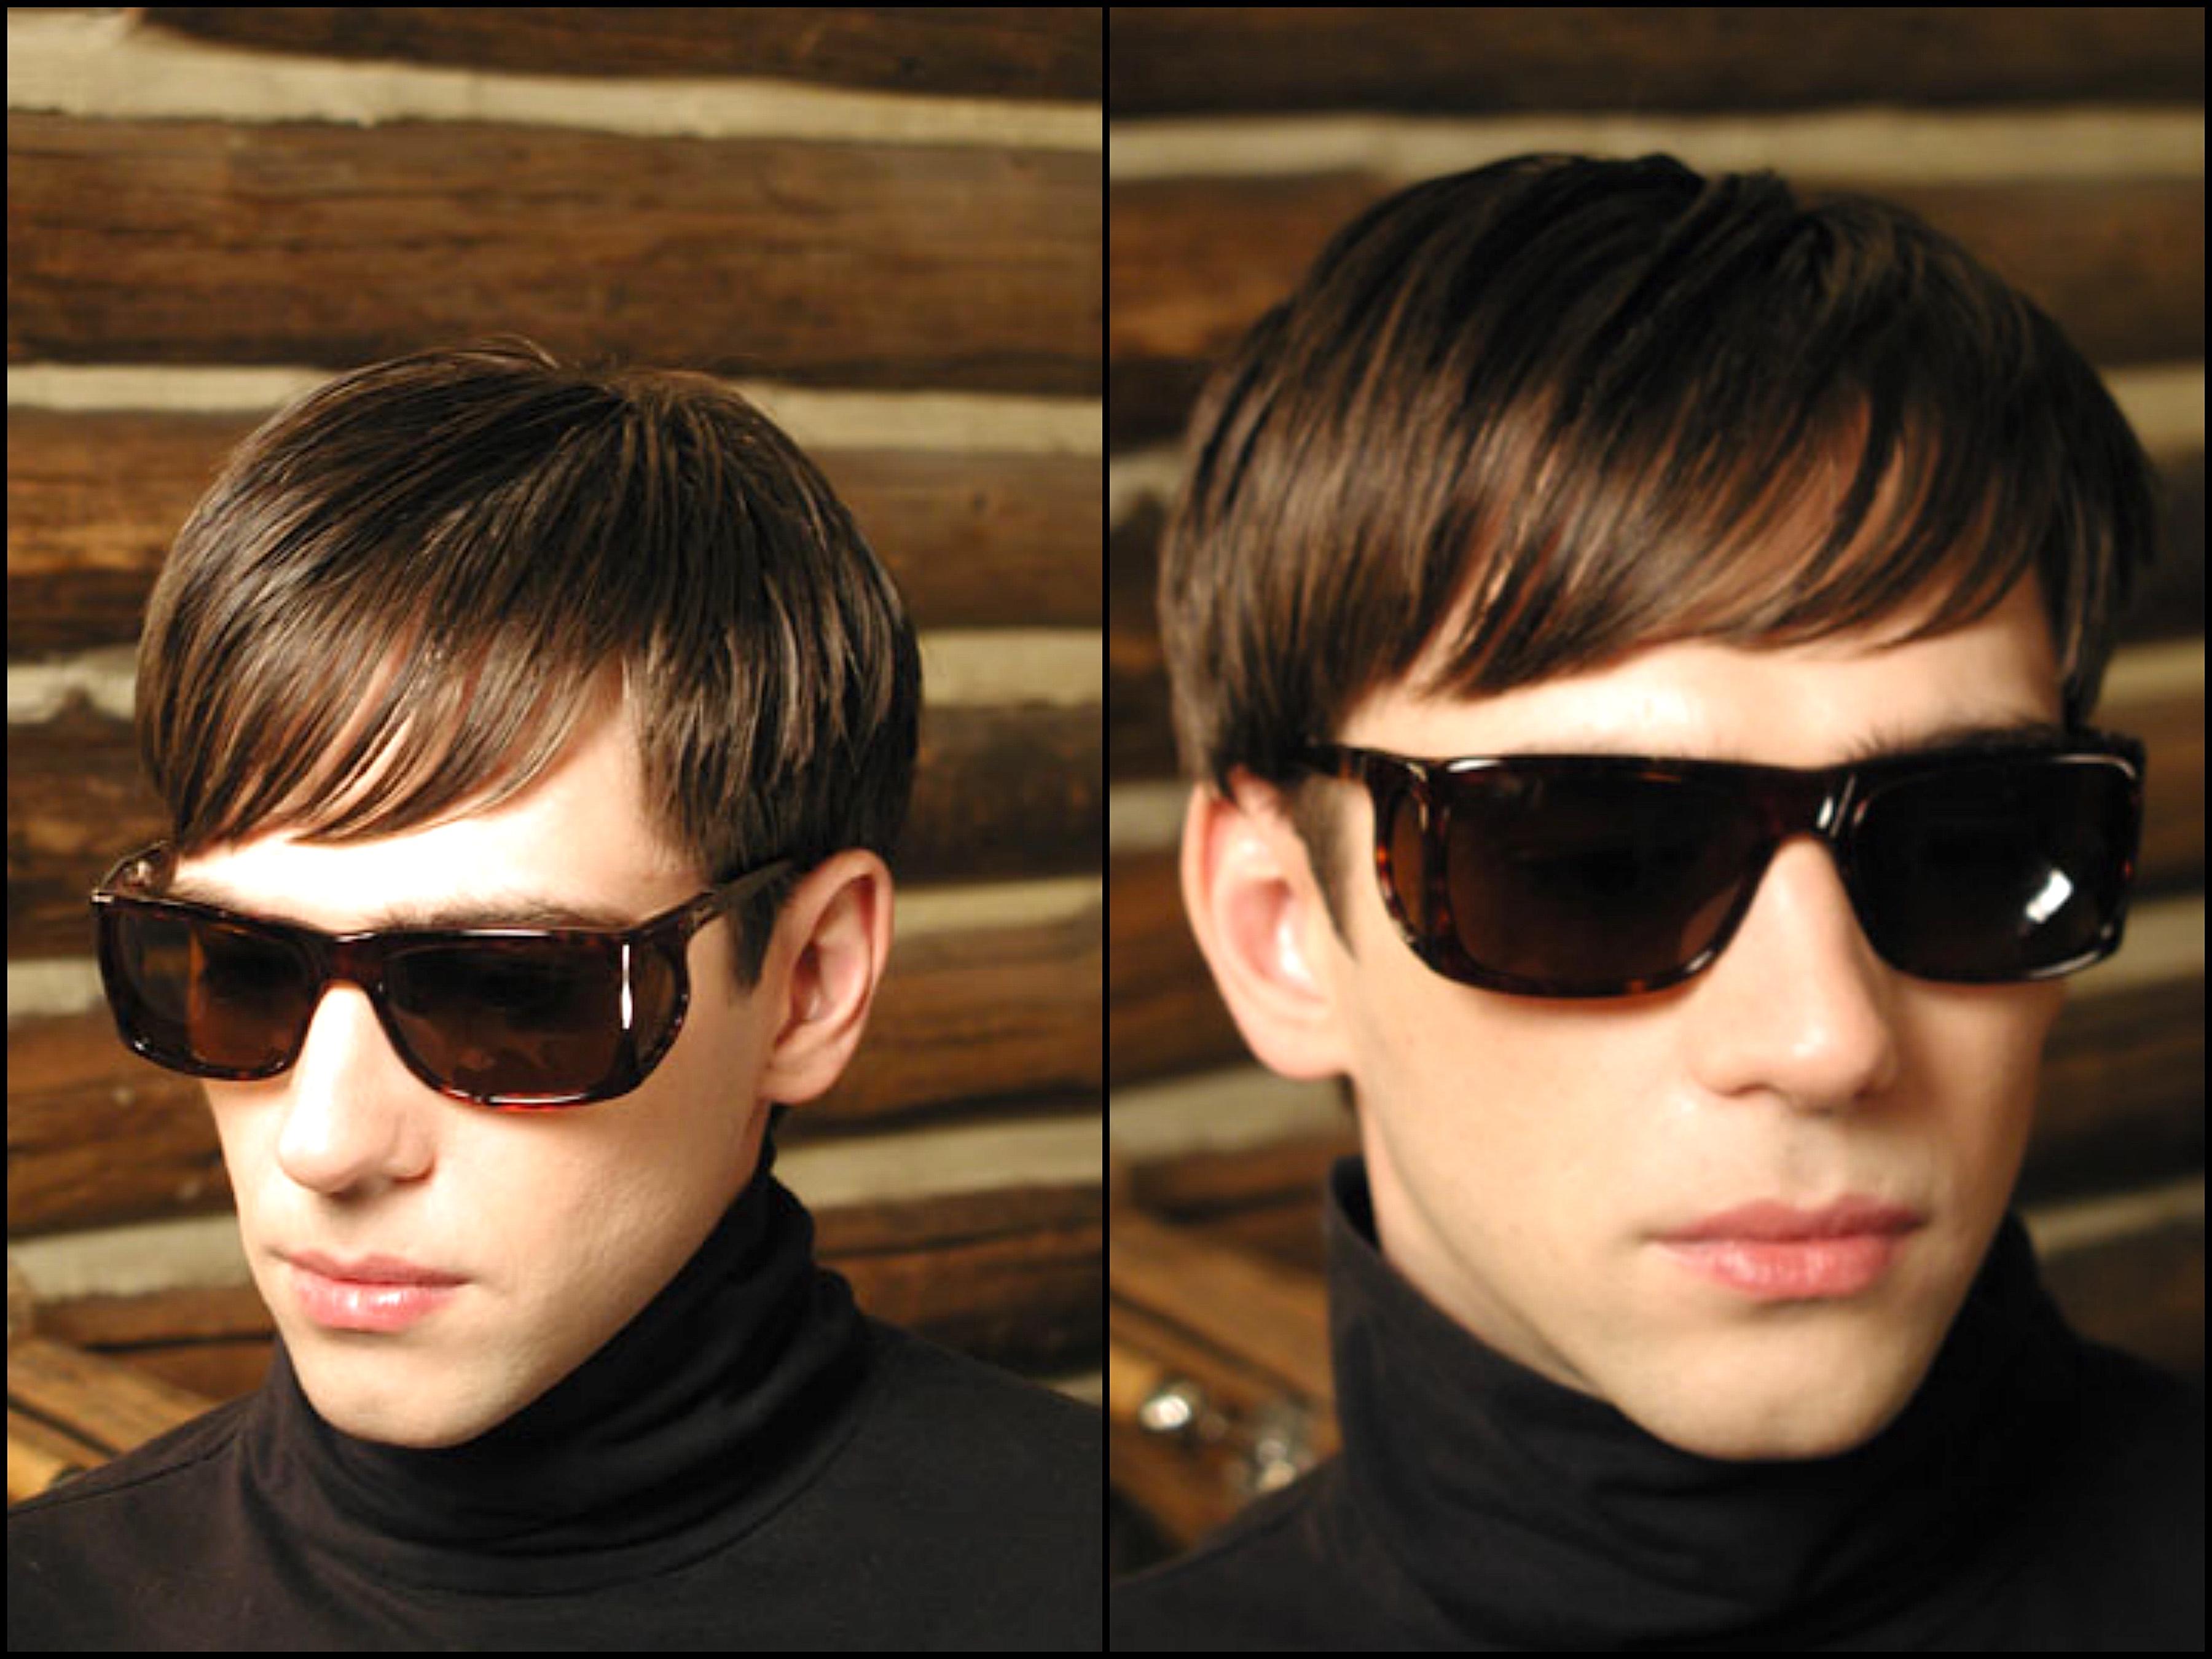 Anton mens 60's mod hair style